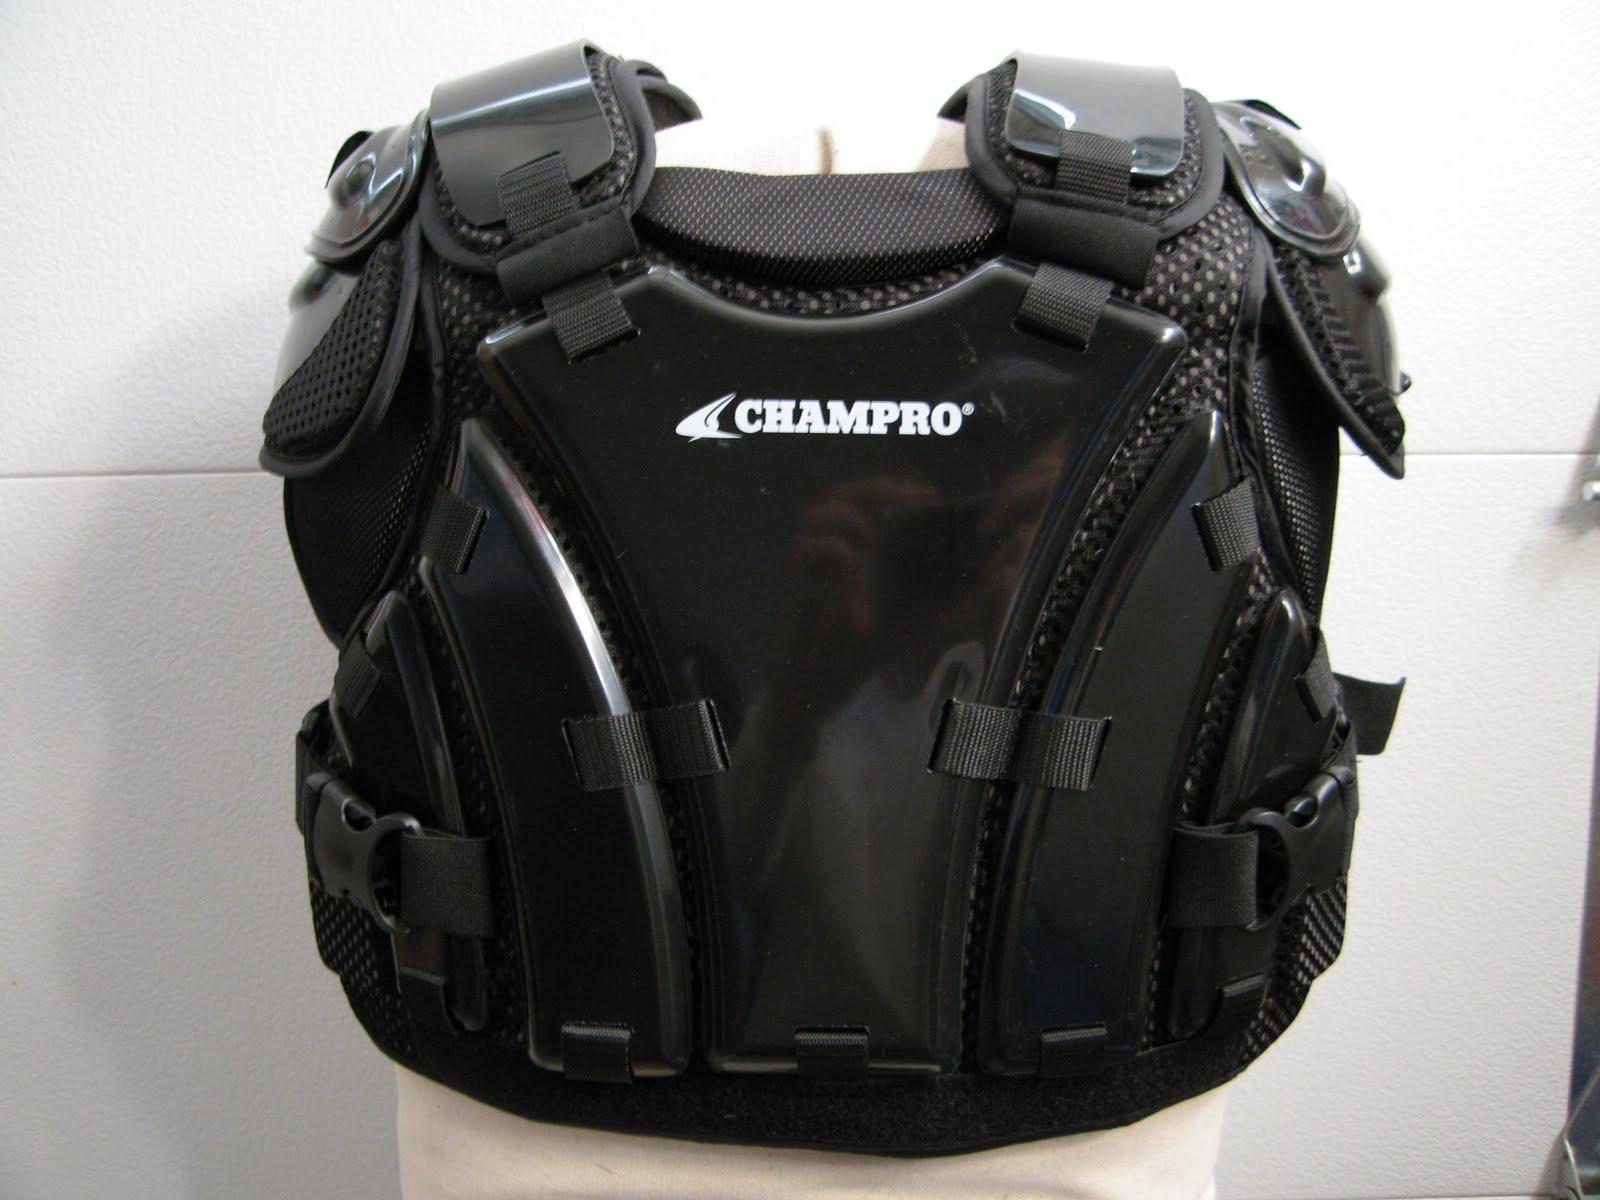 Plate Armor Plus The Champro Pro Plus Armor